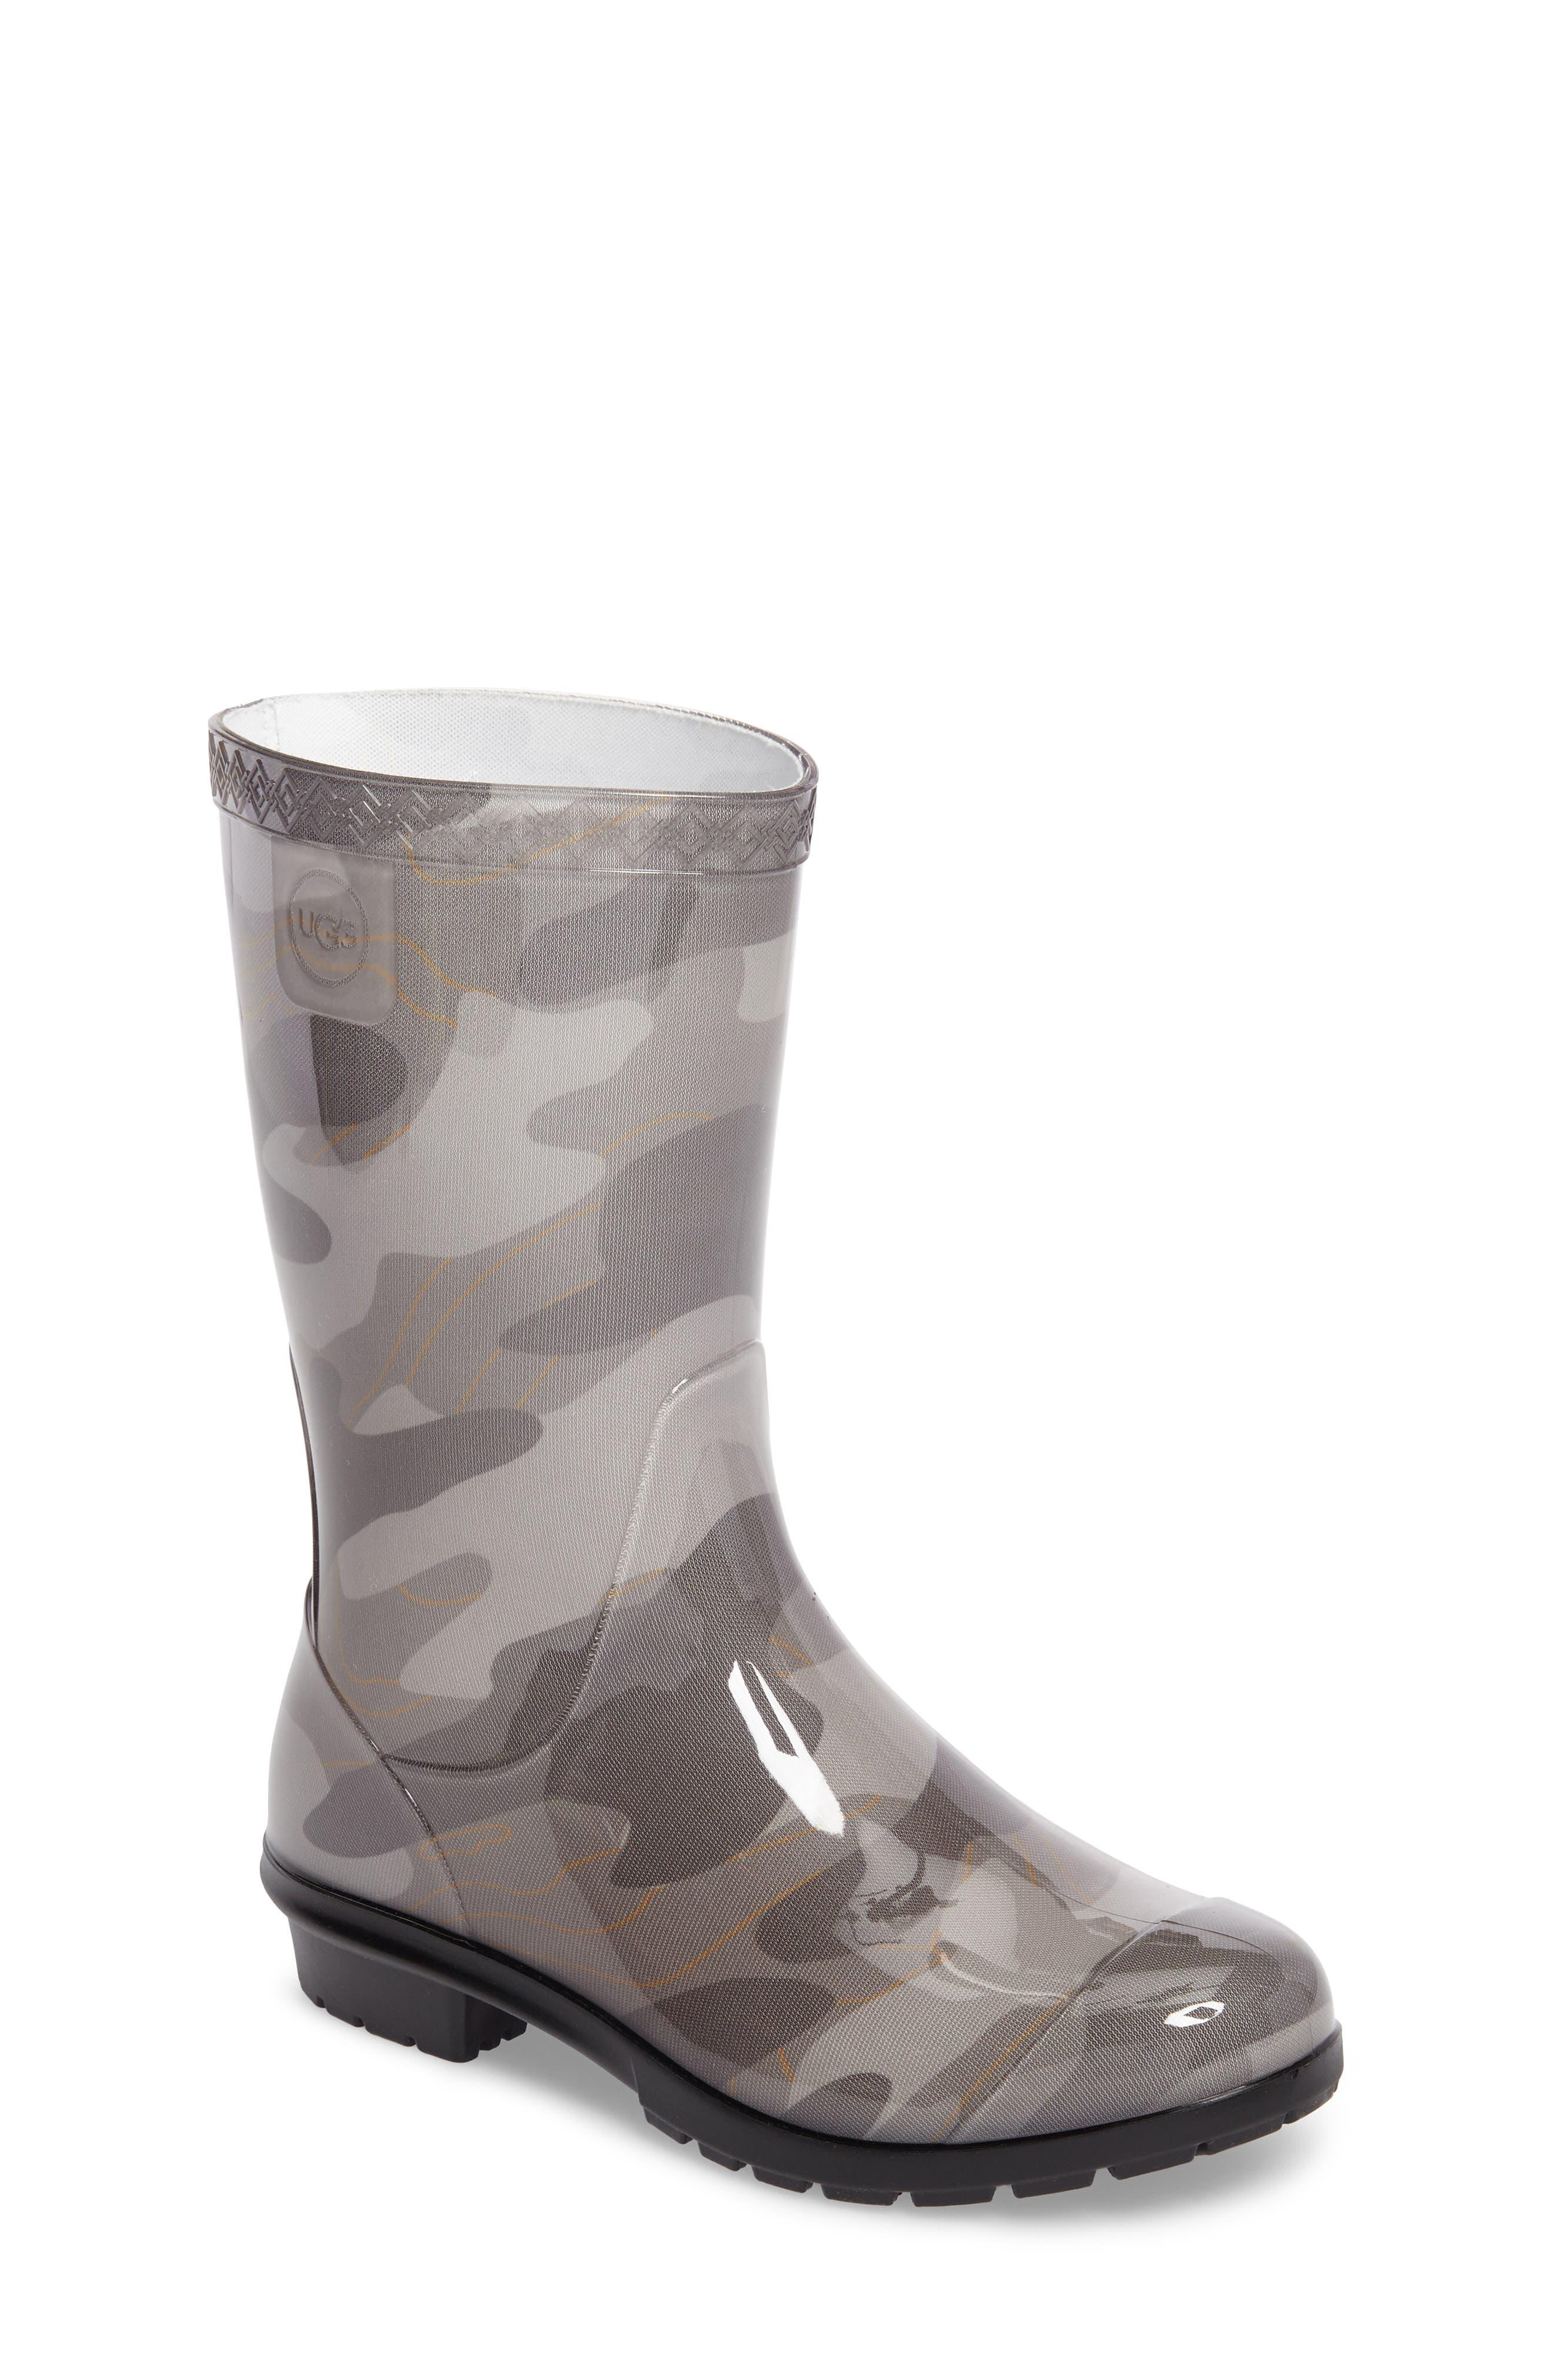 Rahjee Camo Waterproof Rain Boot,                         Main,                         color, 020